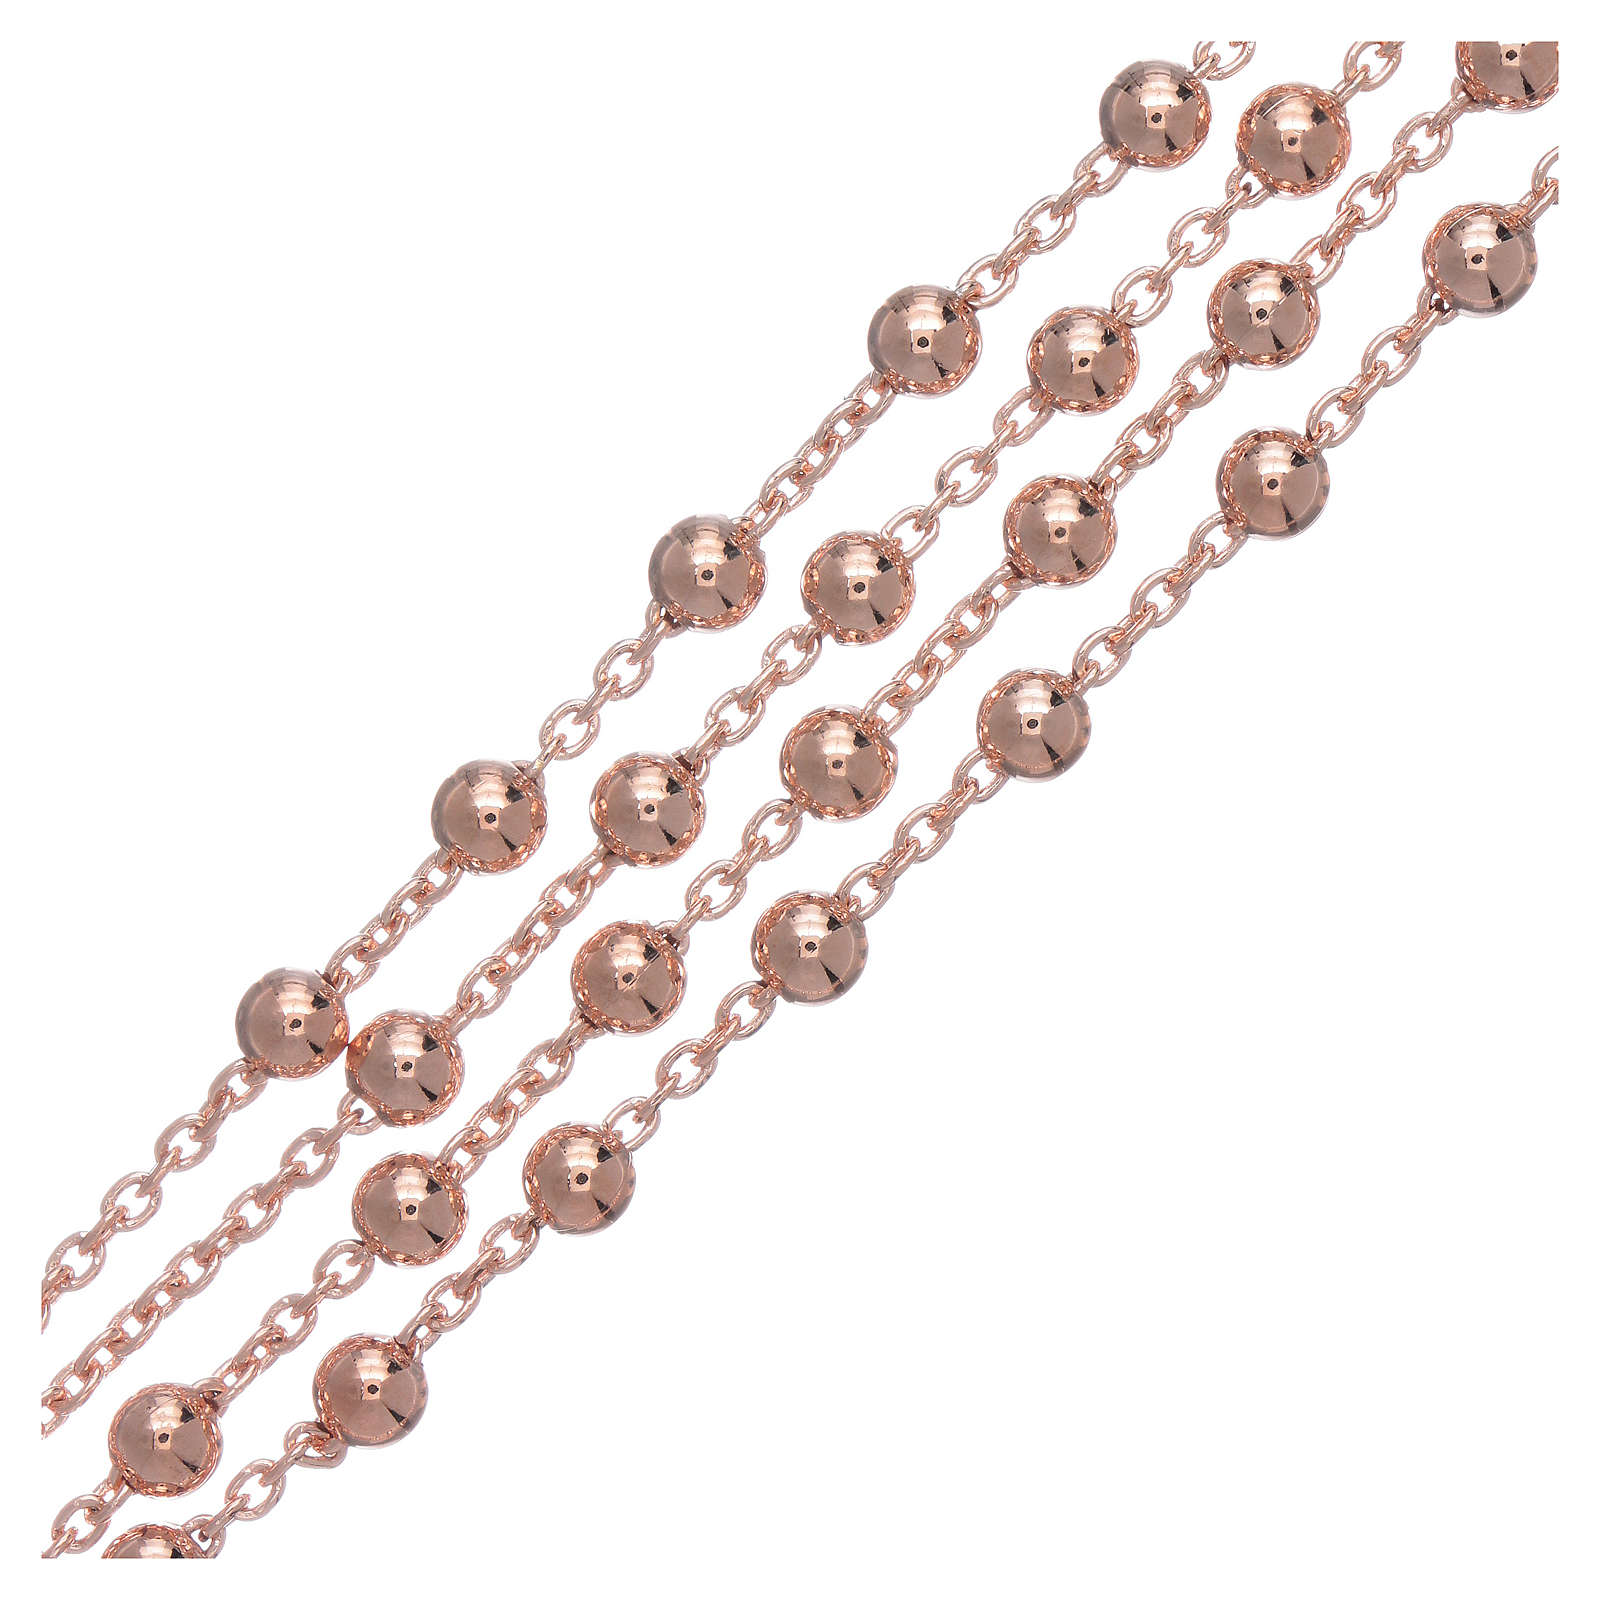 AMEN rosary necklace 4 mm diameter bronze rosè 4